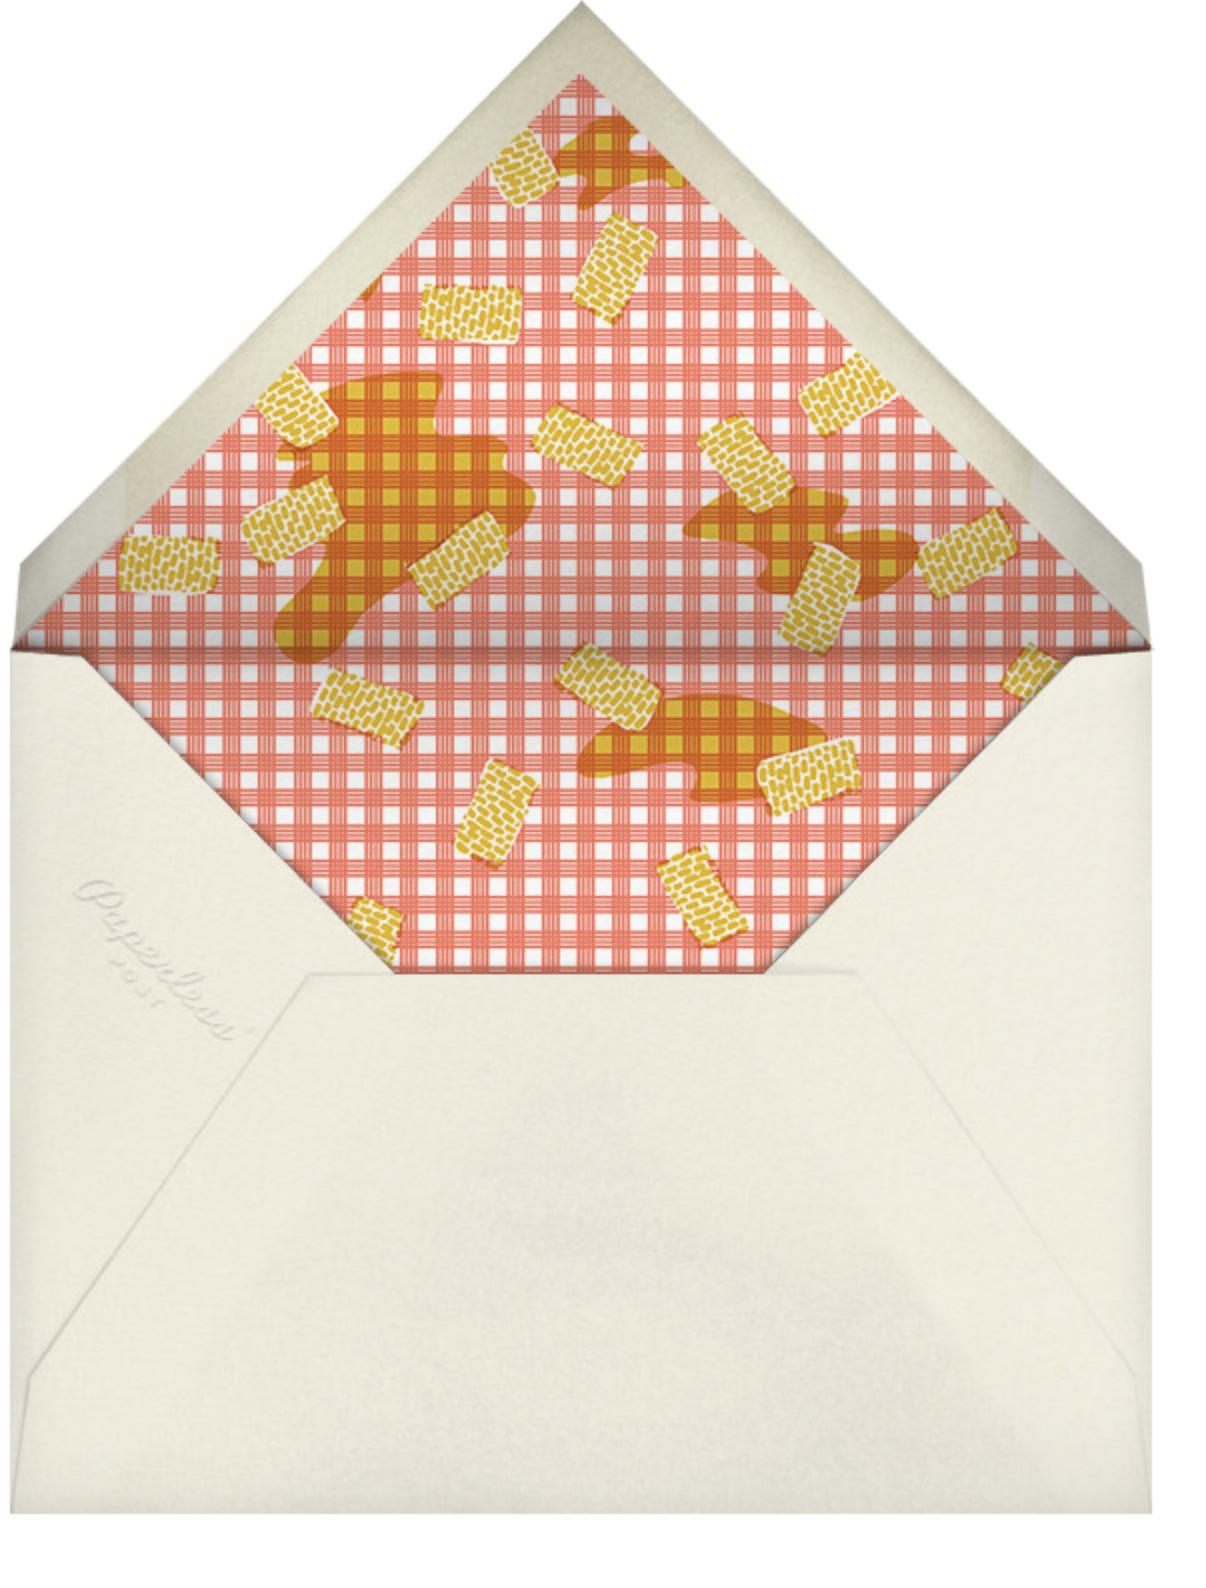 Crawfish Boil - Paperless Post - Envelope